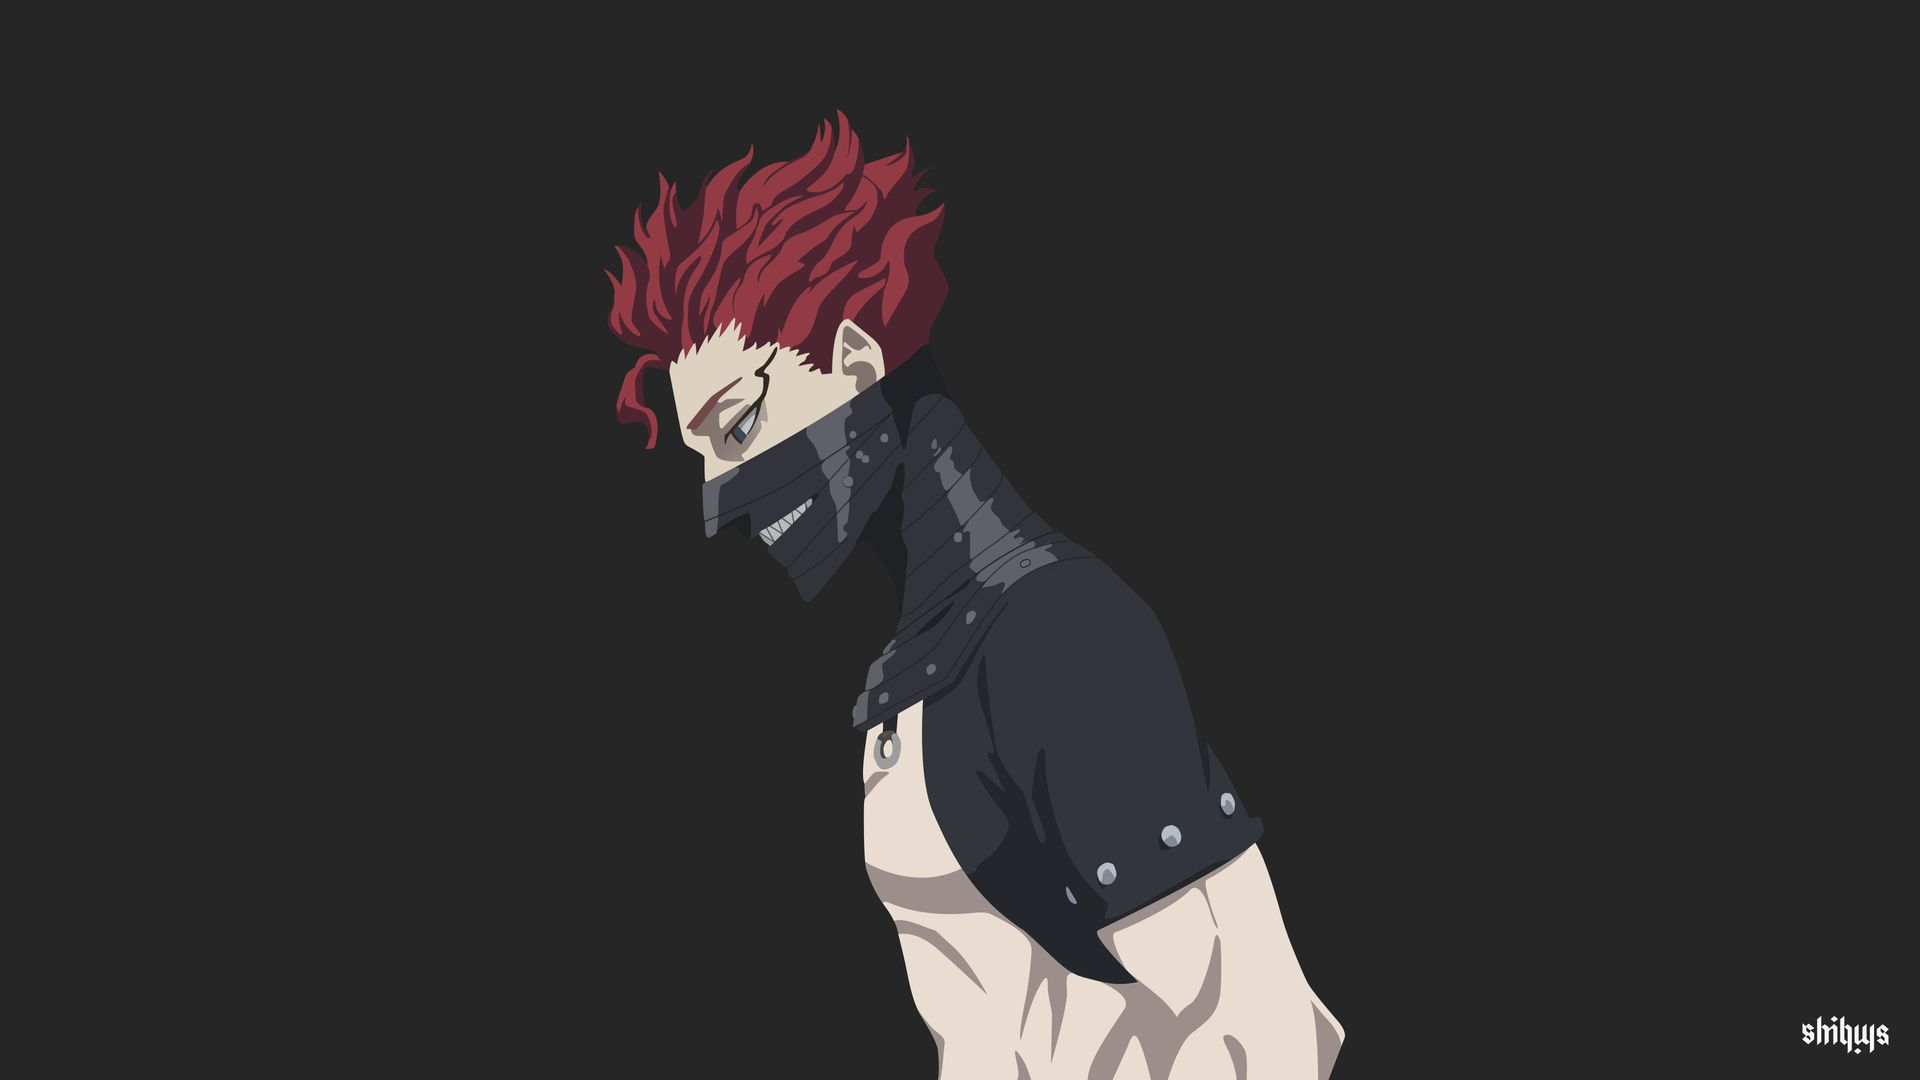 Black Clover Zora Ideale Wallpaper - Anime Wallpaper HD